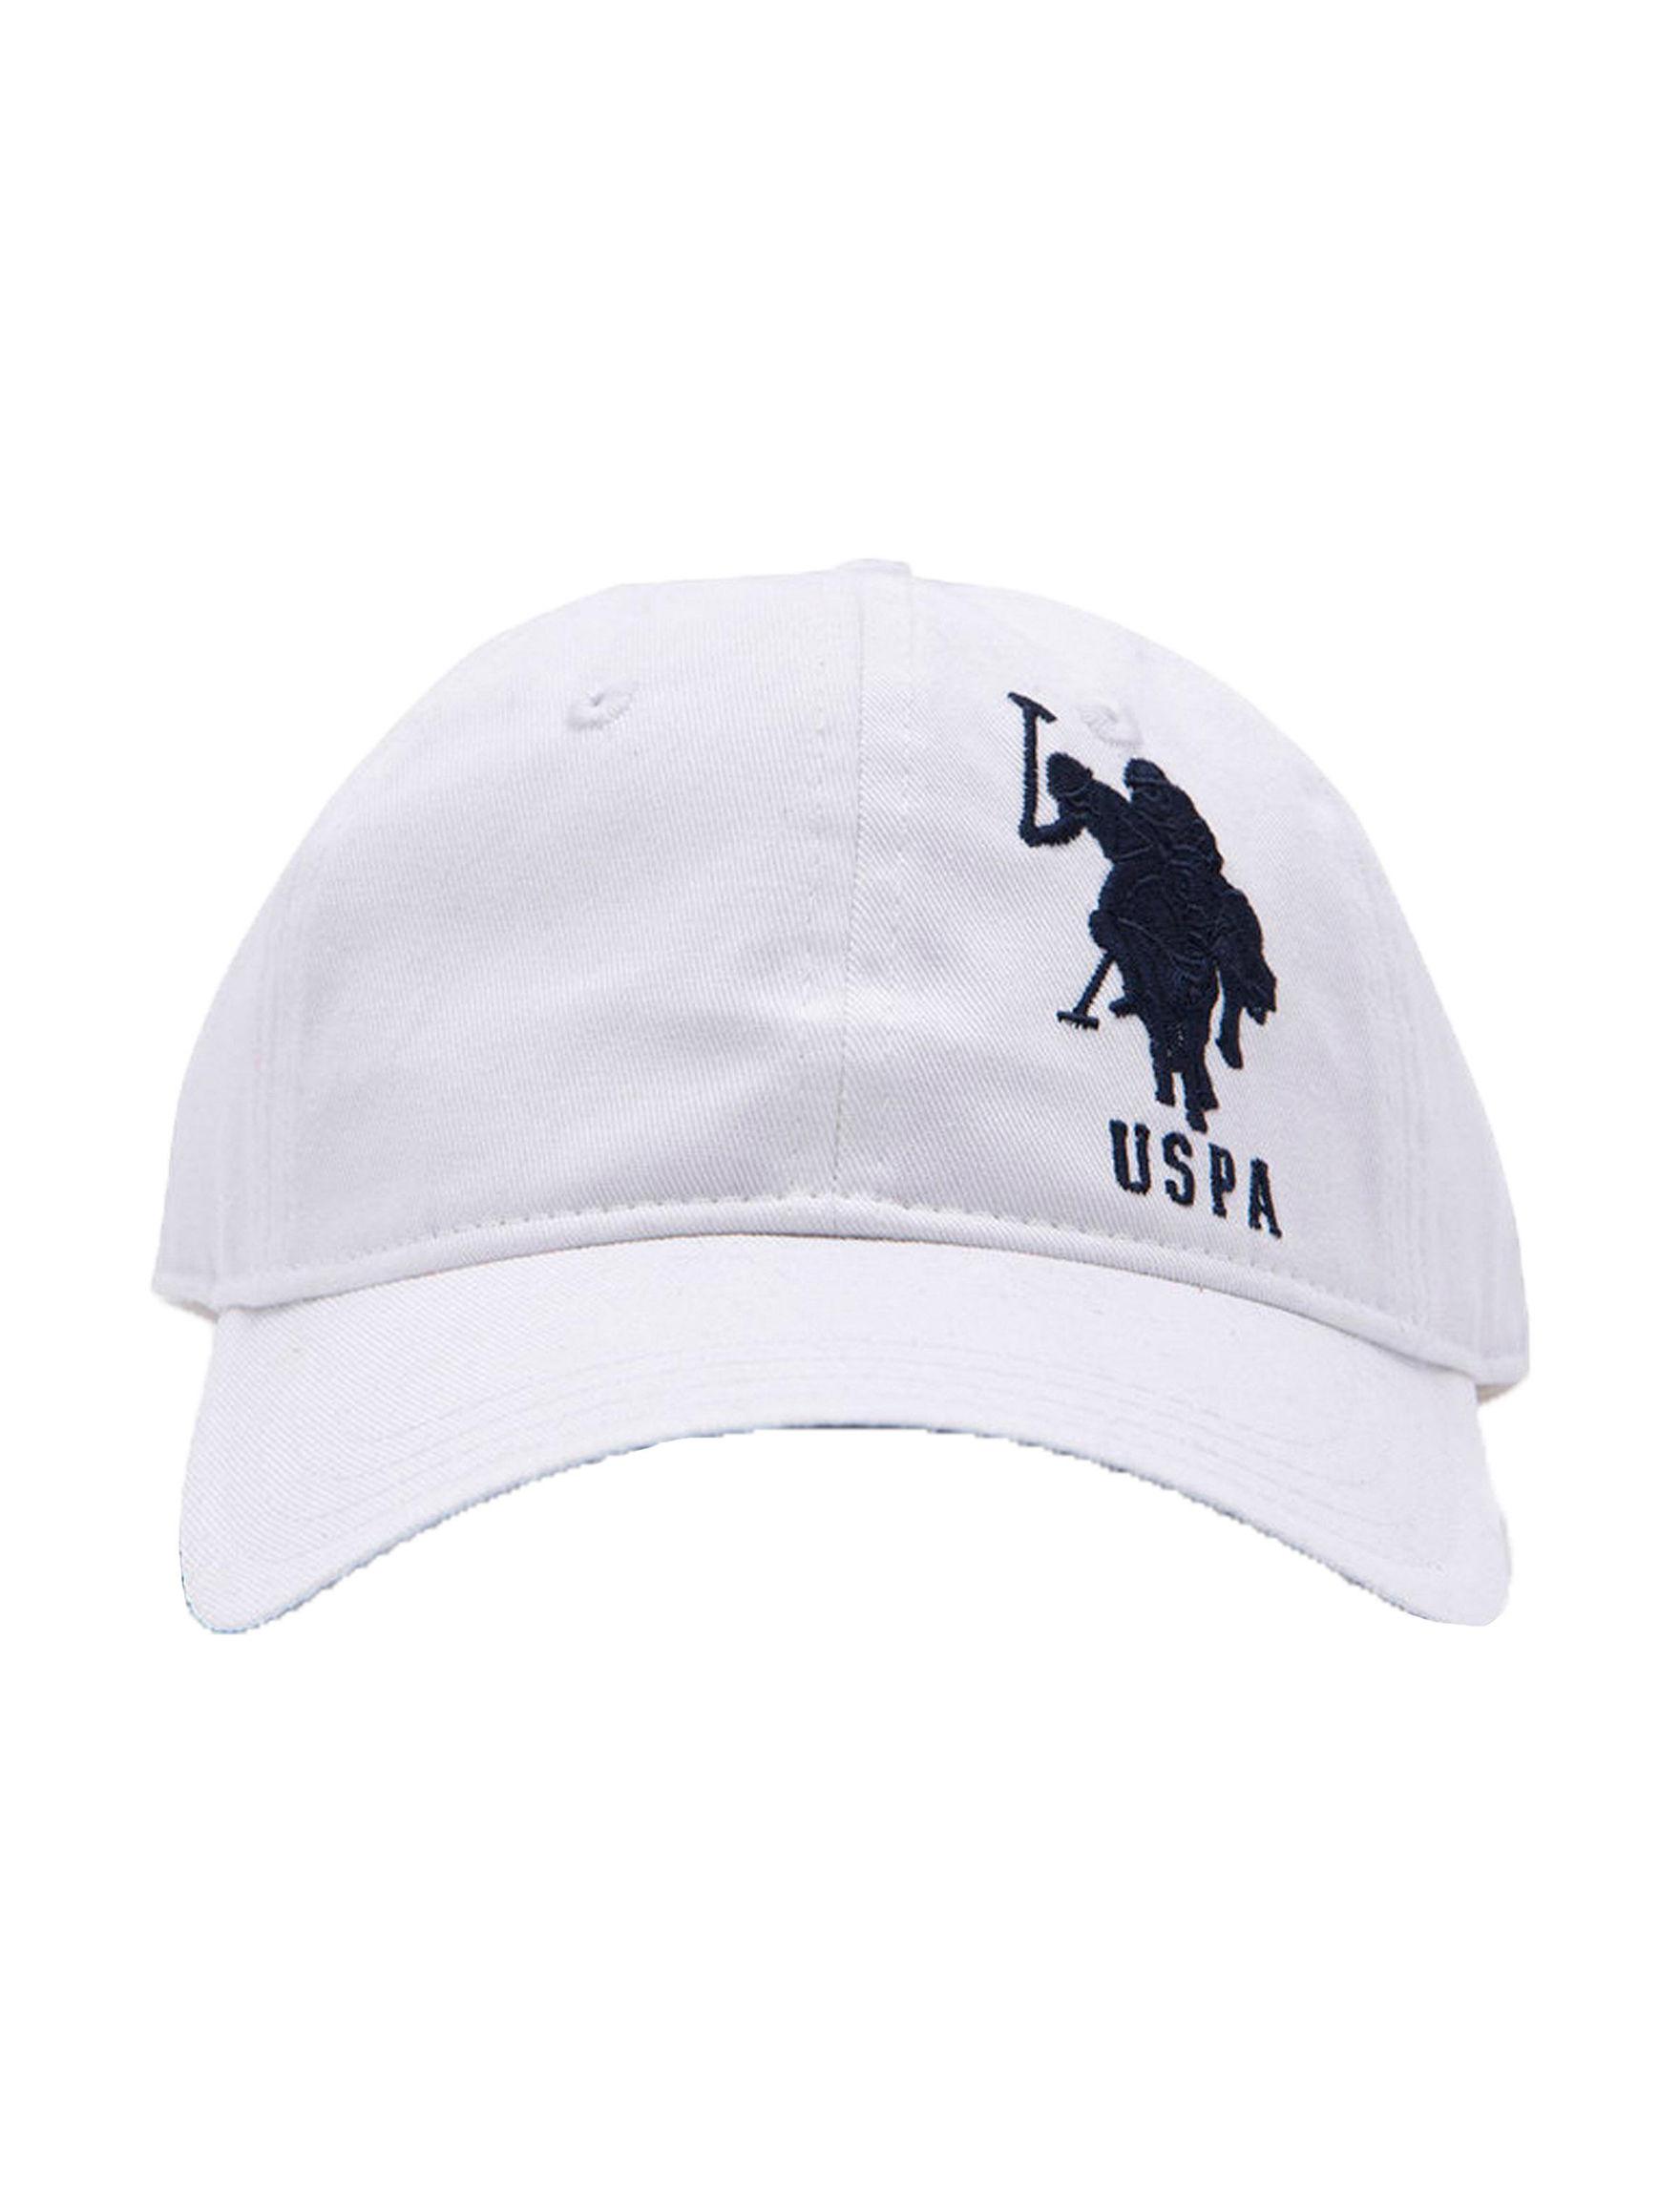 U.S. Polo Assn. White Hats & Headwear